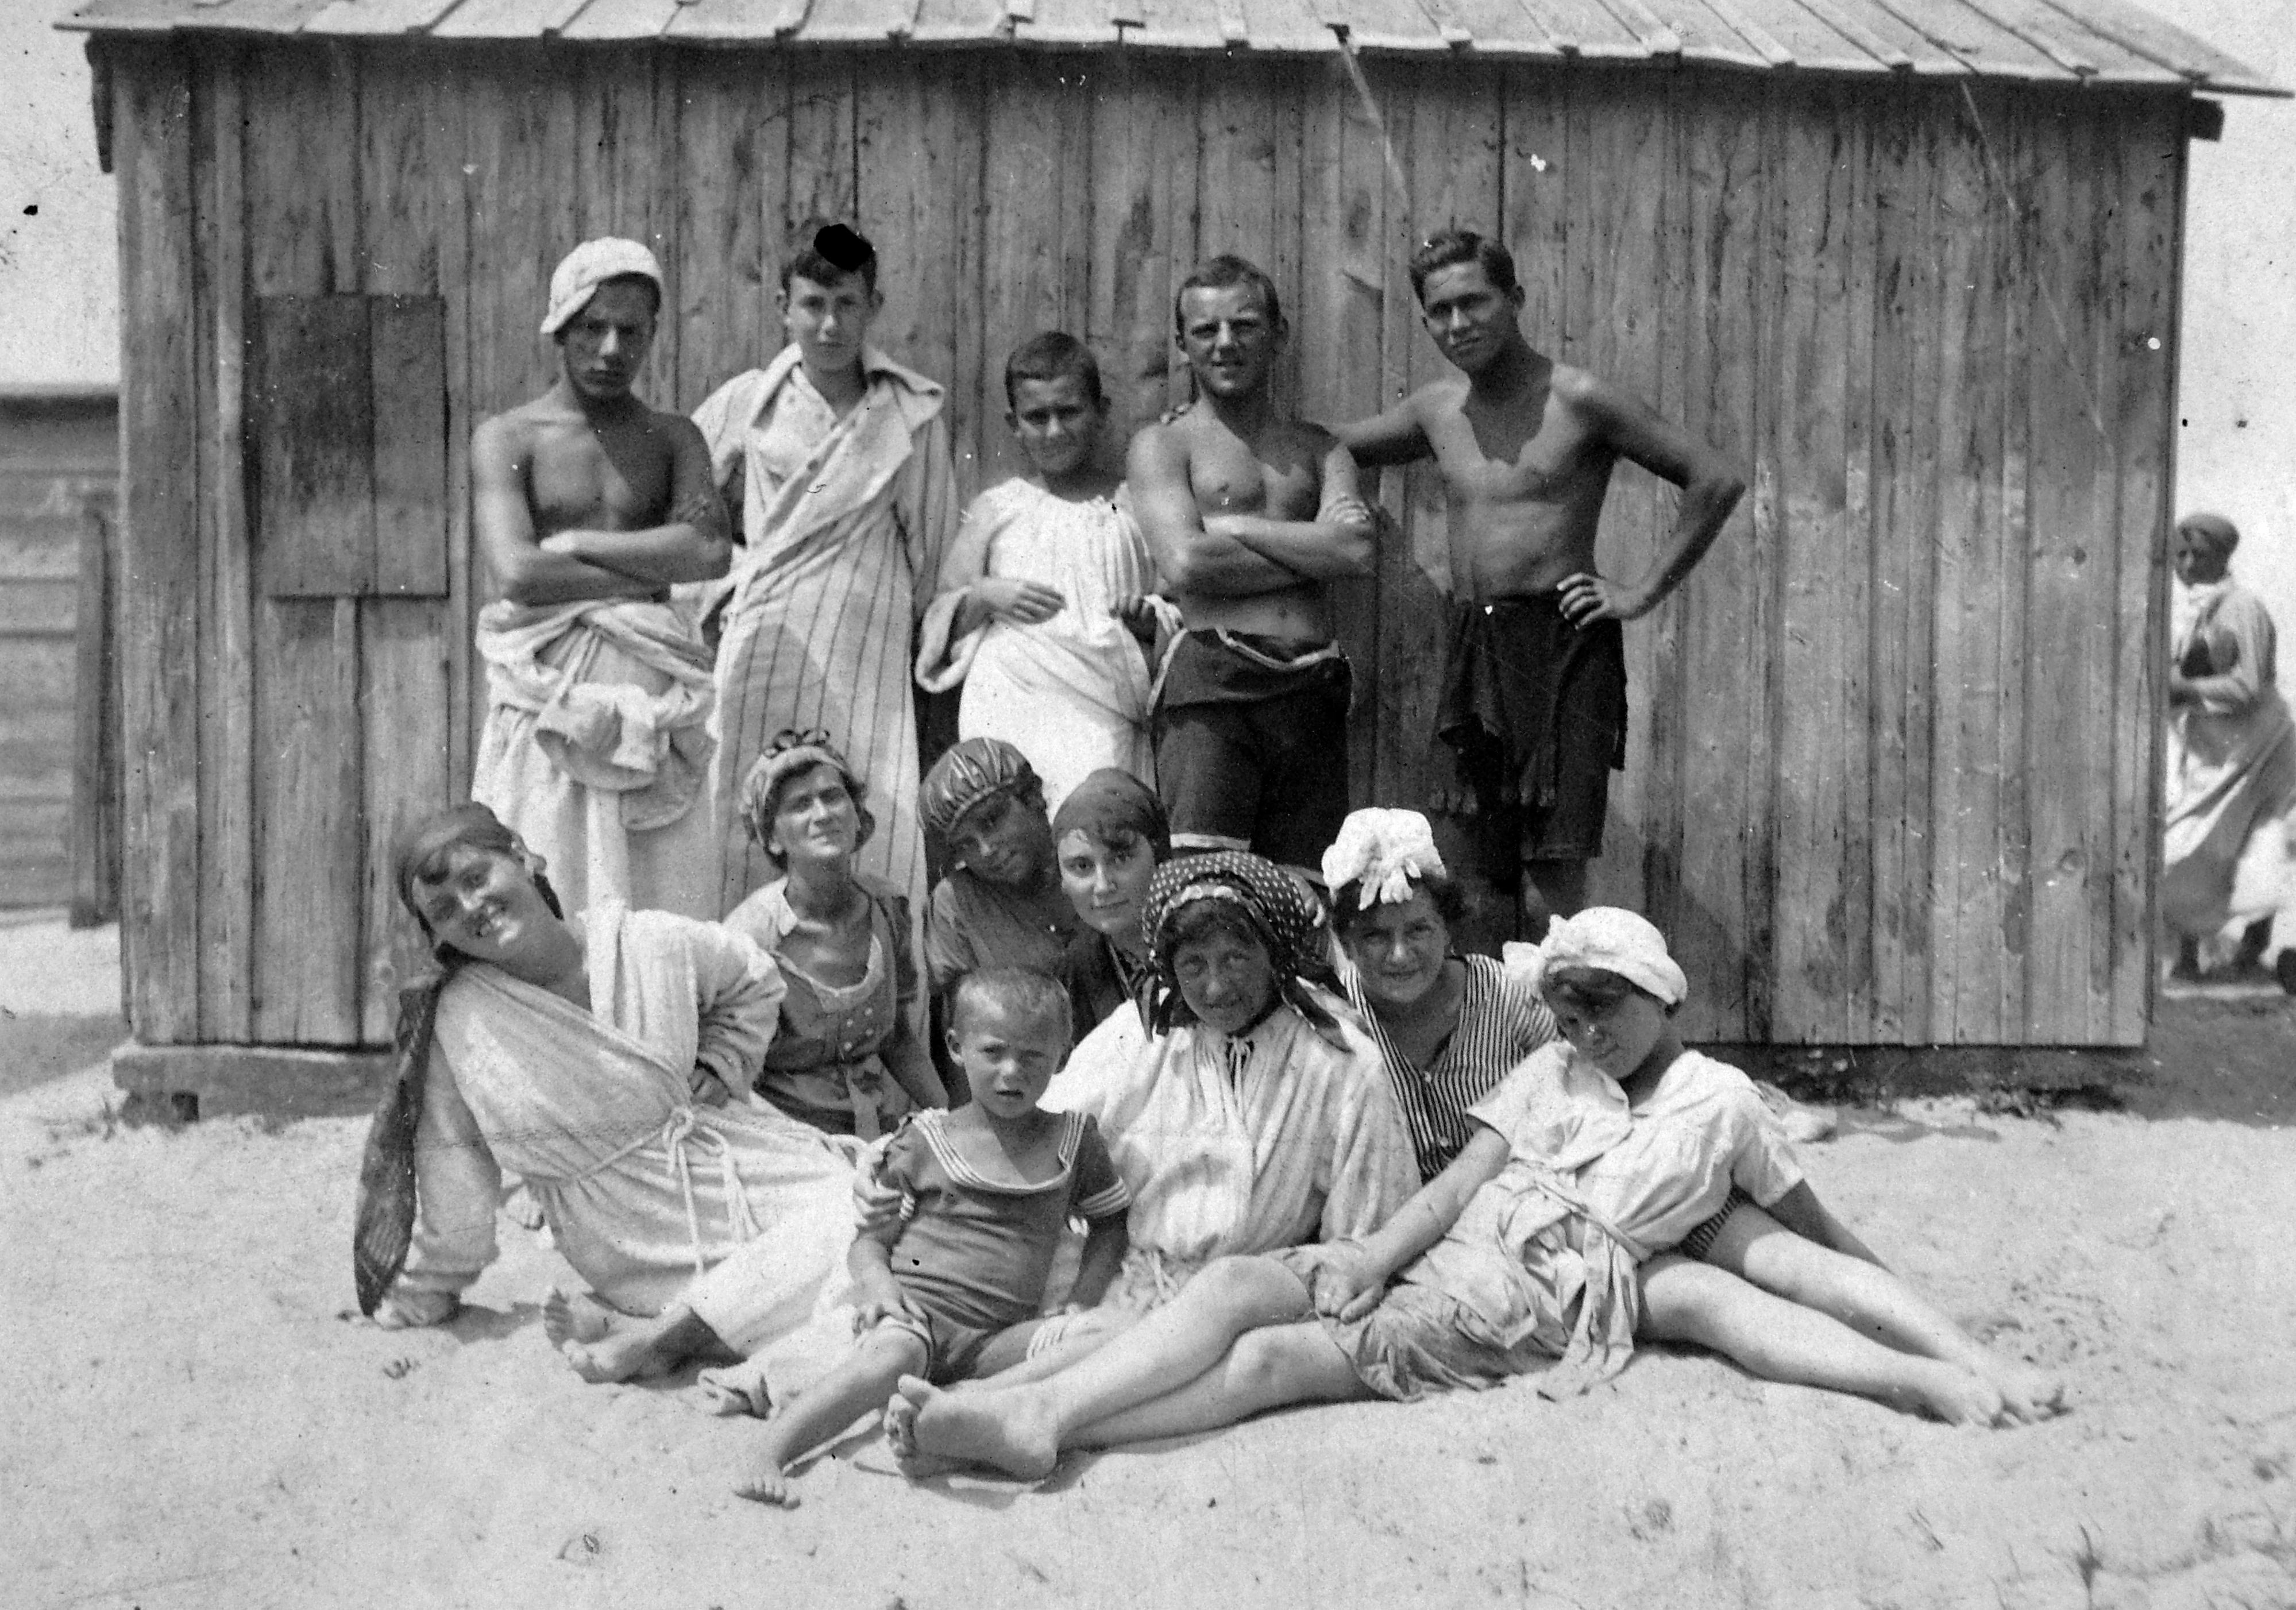 File Beach Changing Cabin Bathrobe Bathing Suit Bathing Caps Summer Fun Men Women Kids Fortepan 4652 Jpg Wikimedia Commons